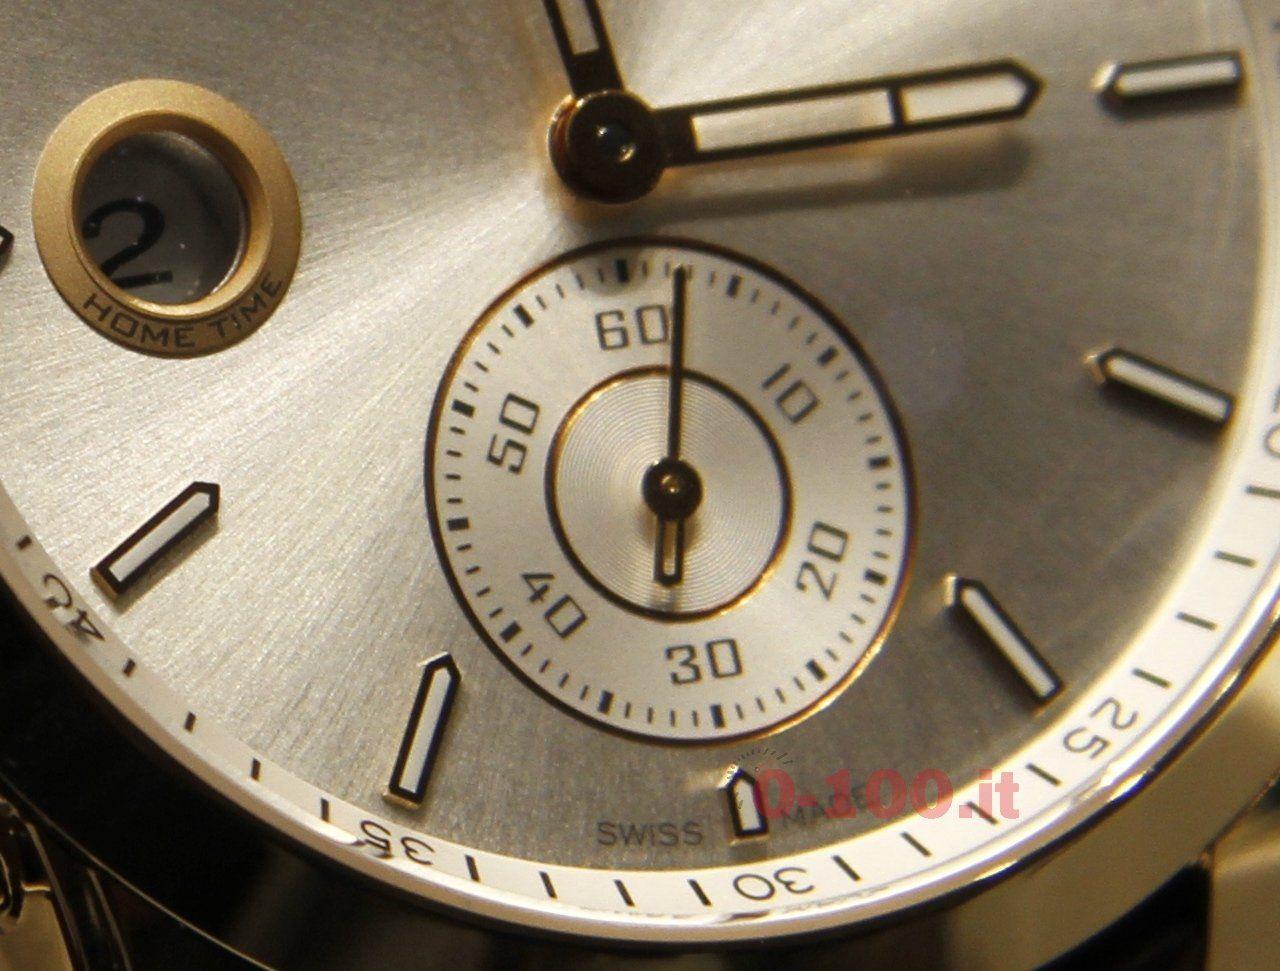 baselworld-2014-Ulysse Nardin Dual Time Manufacture_Ref_3346-126-91_0-1006